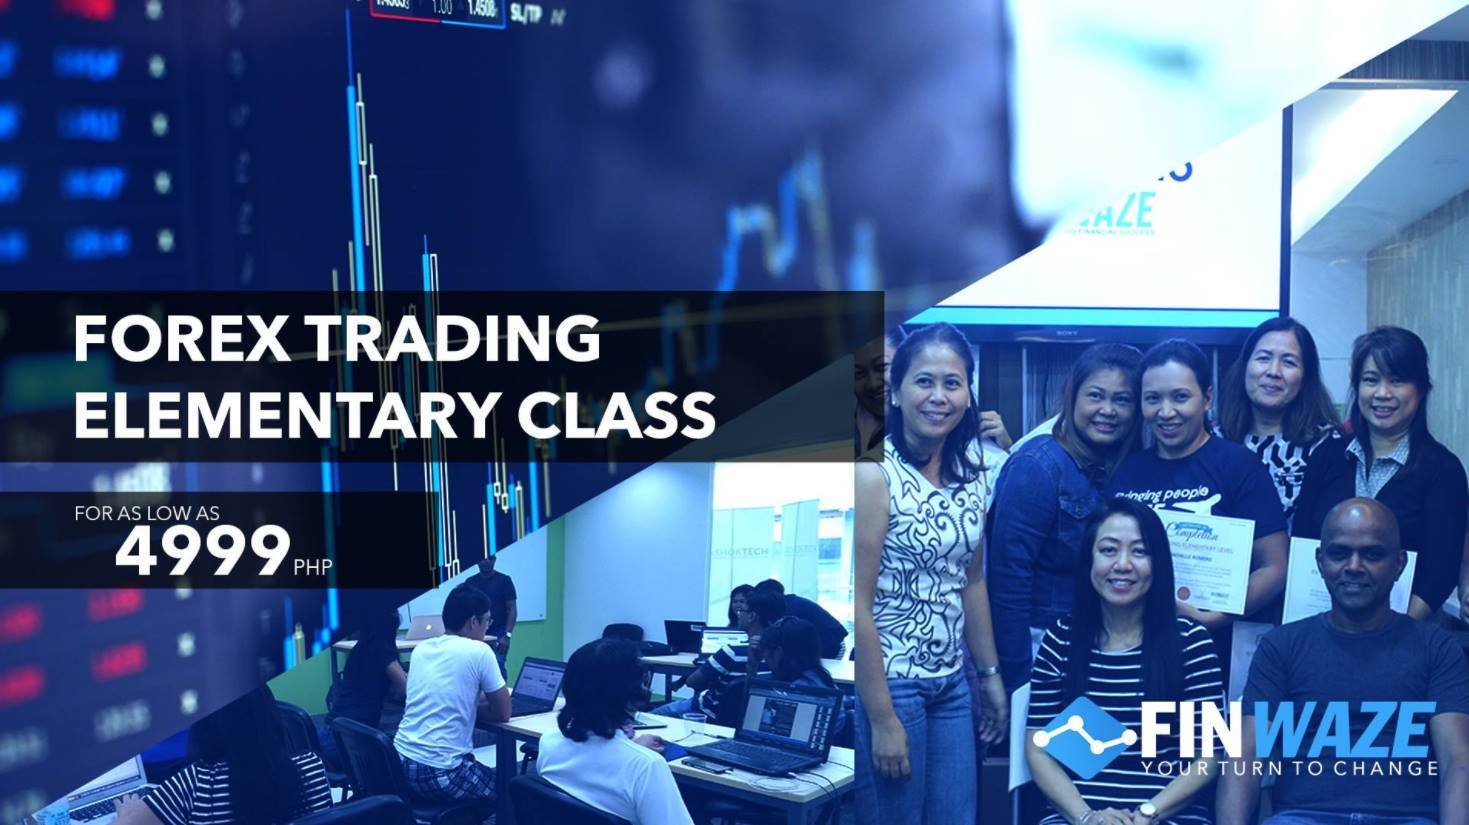 finwaze forex trading elementary class